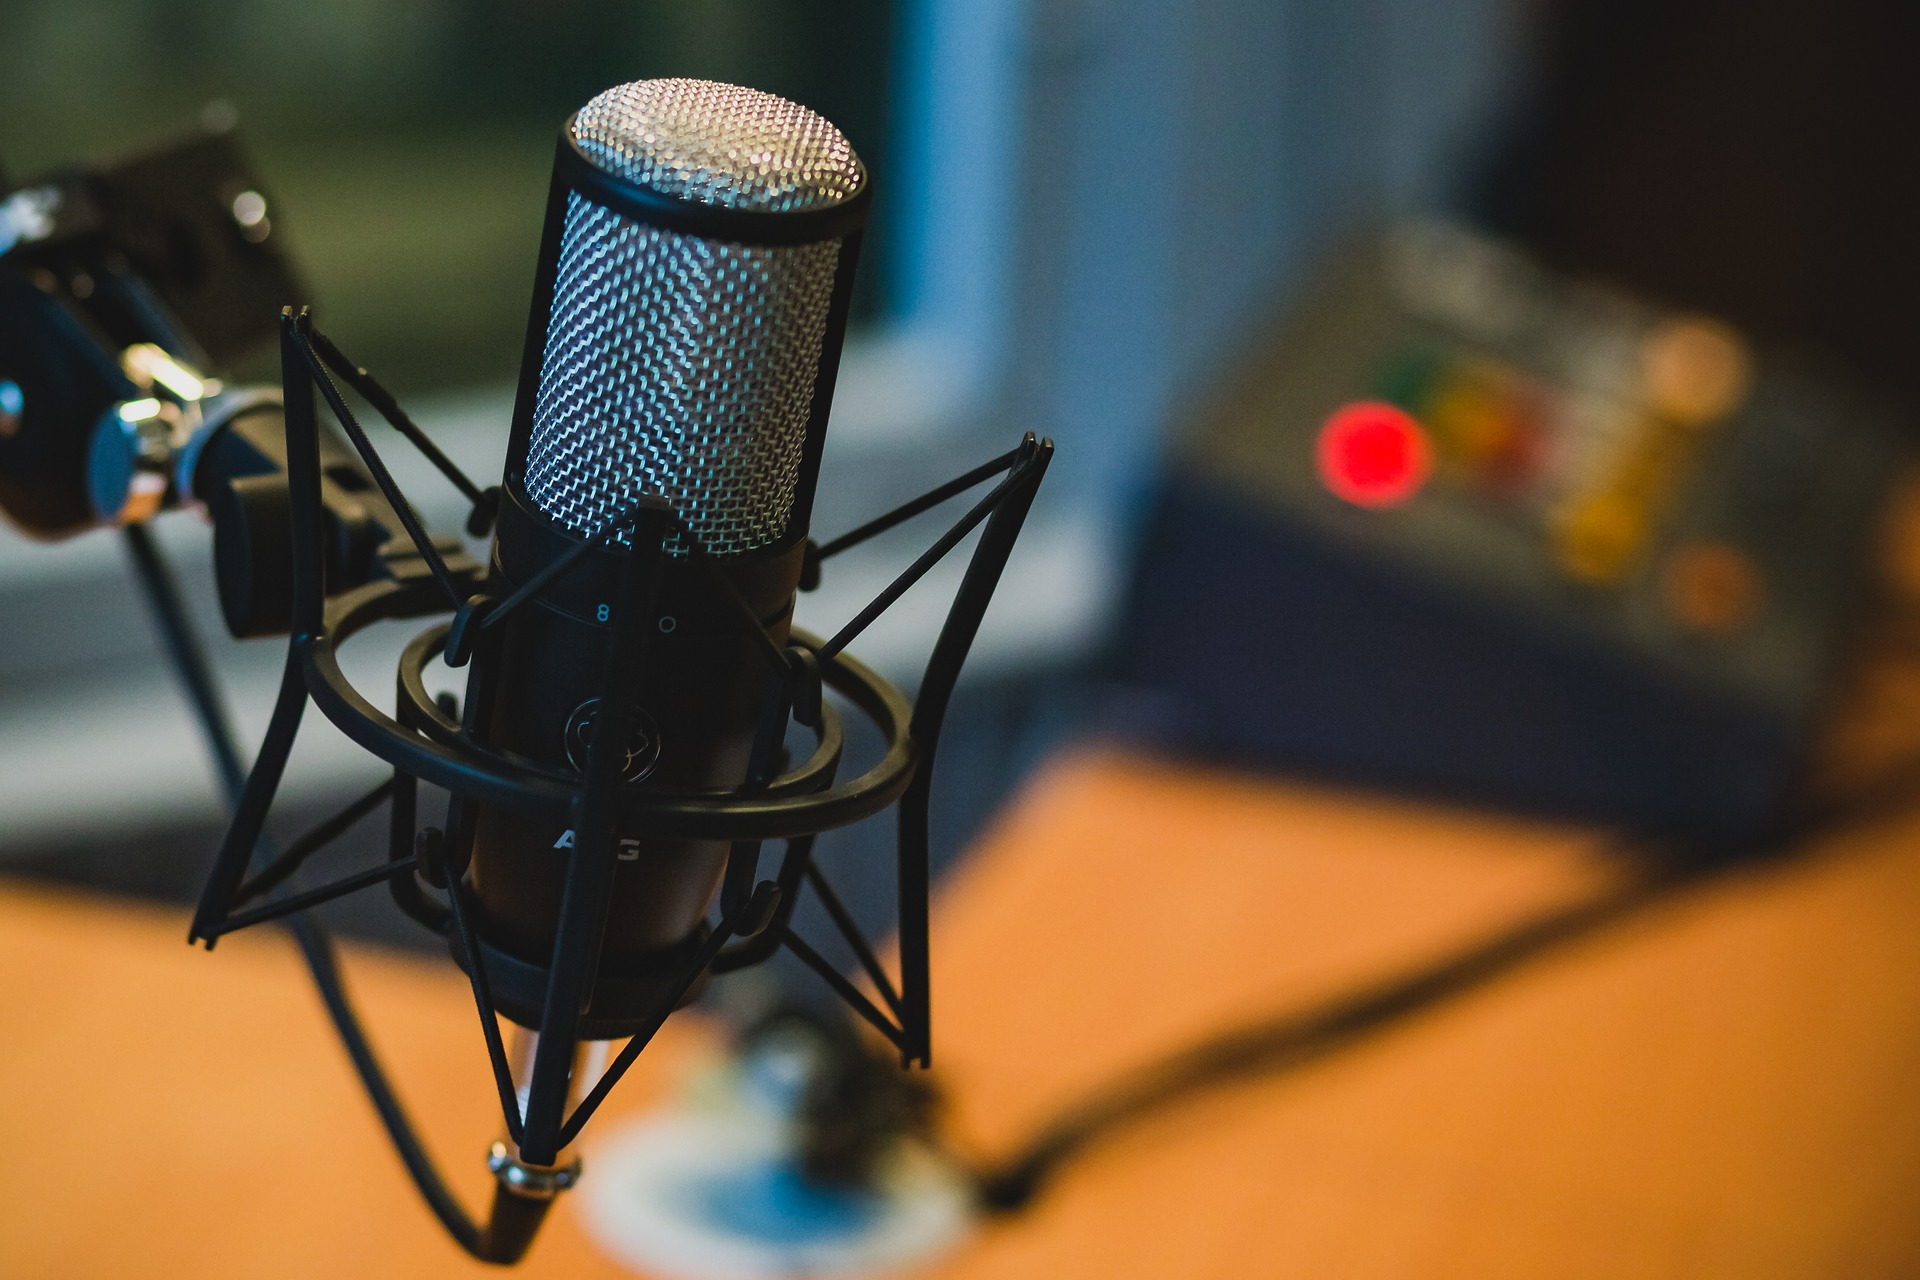 Trip-Drop en el podcast de La Maleta de Carla